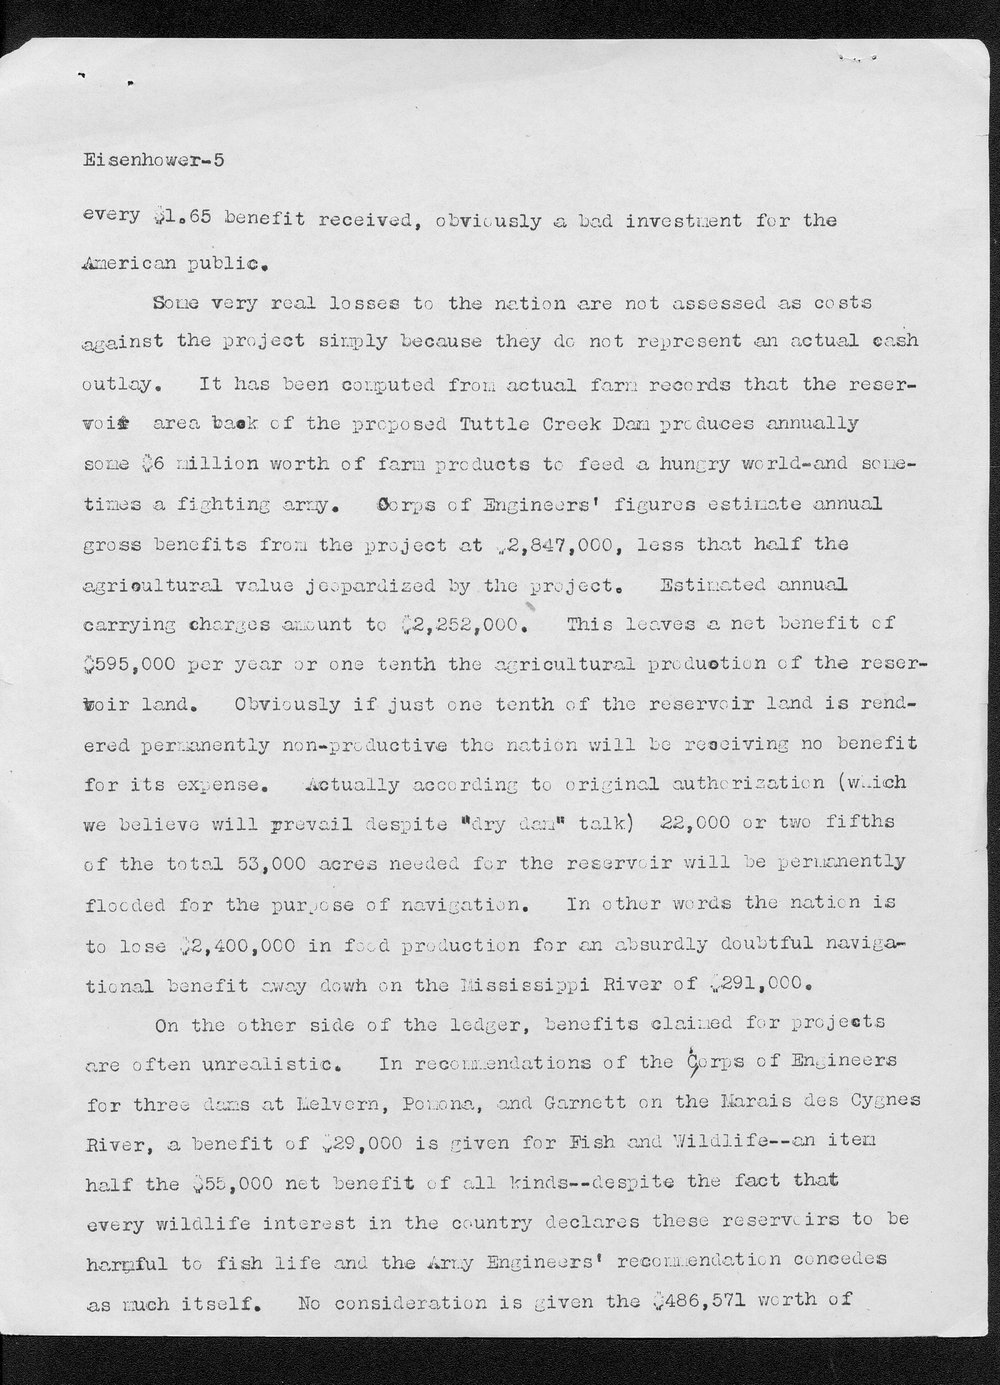 Edith Monfort to Dwight Eisenhower - 5